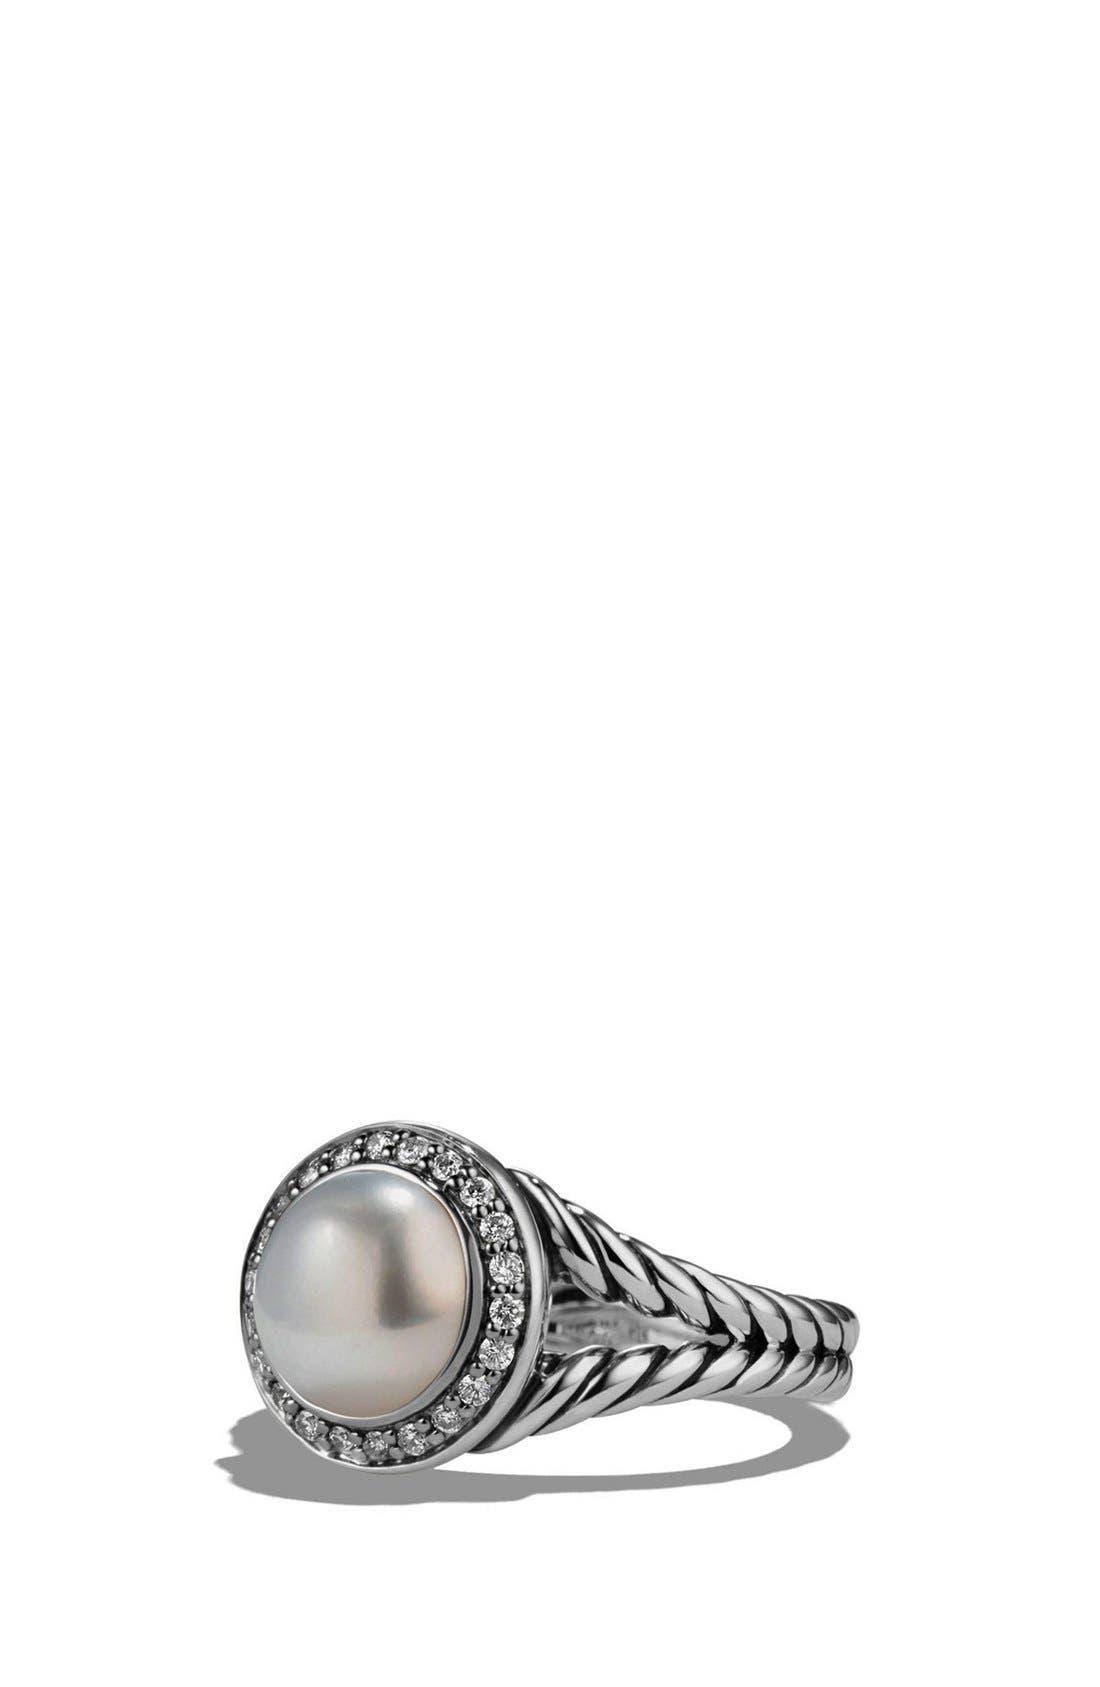 Main Image - David Yurman 'Cerise' Ring with Pearl and Diamonds